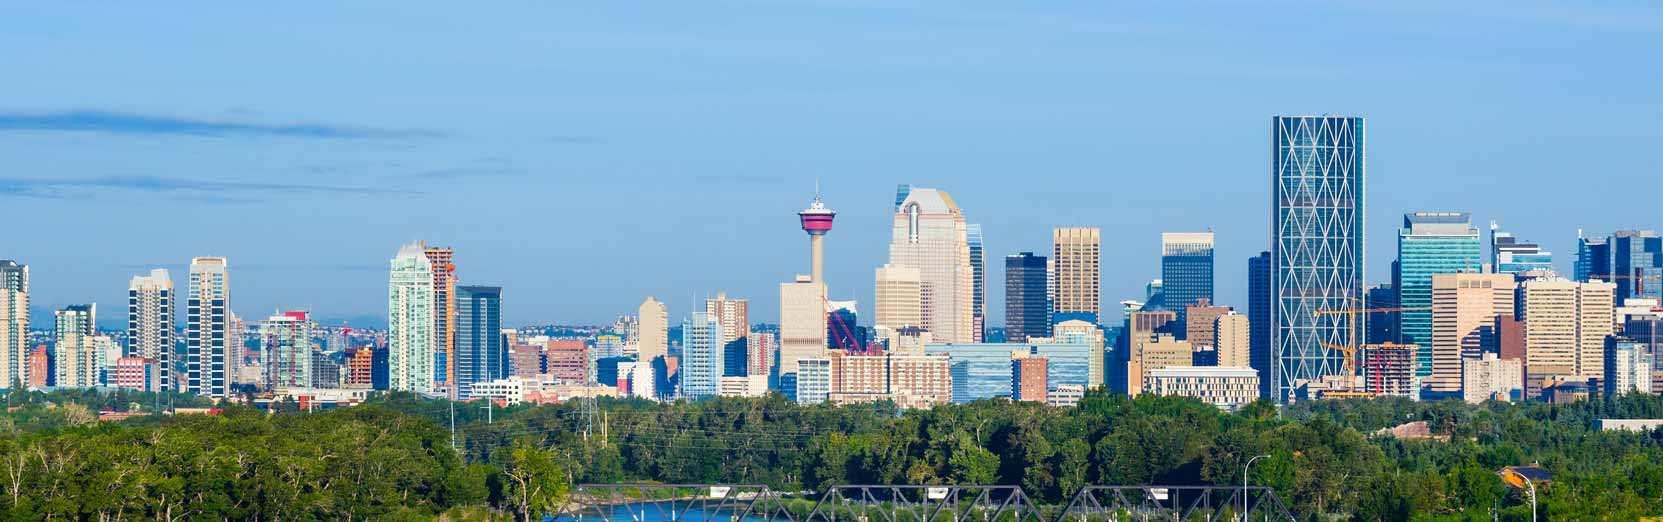 Auto mieten in Calgary